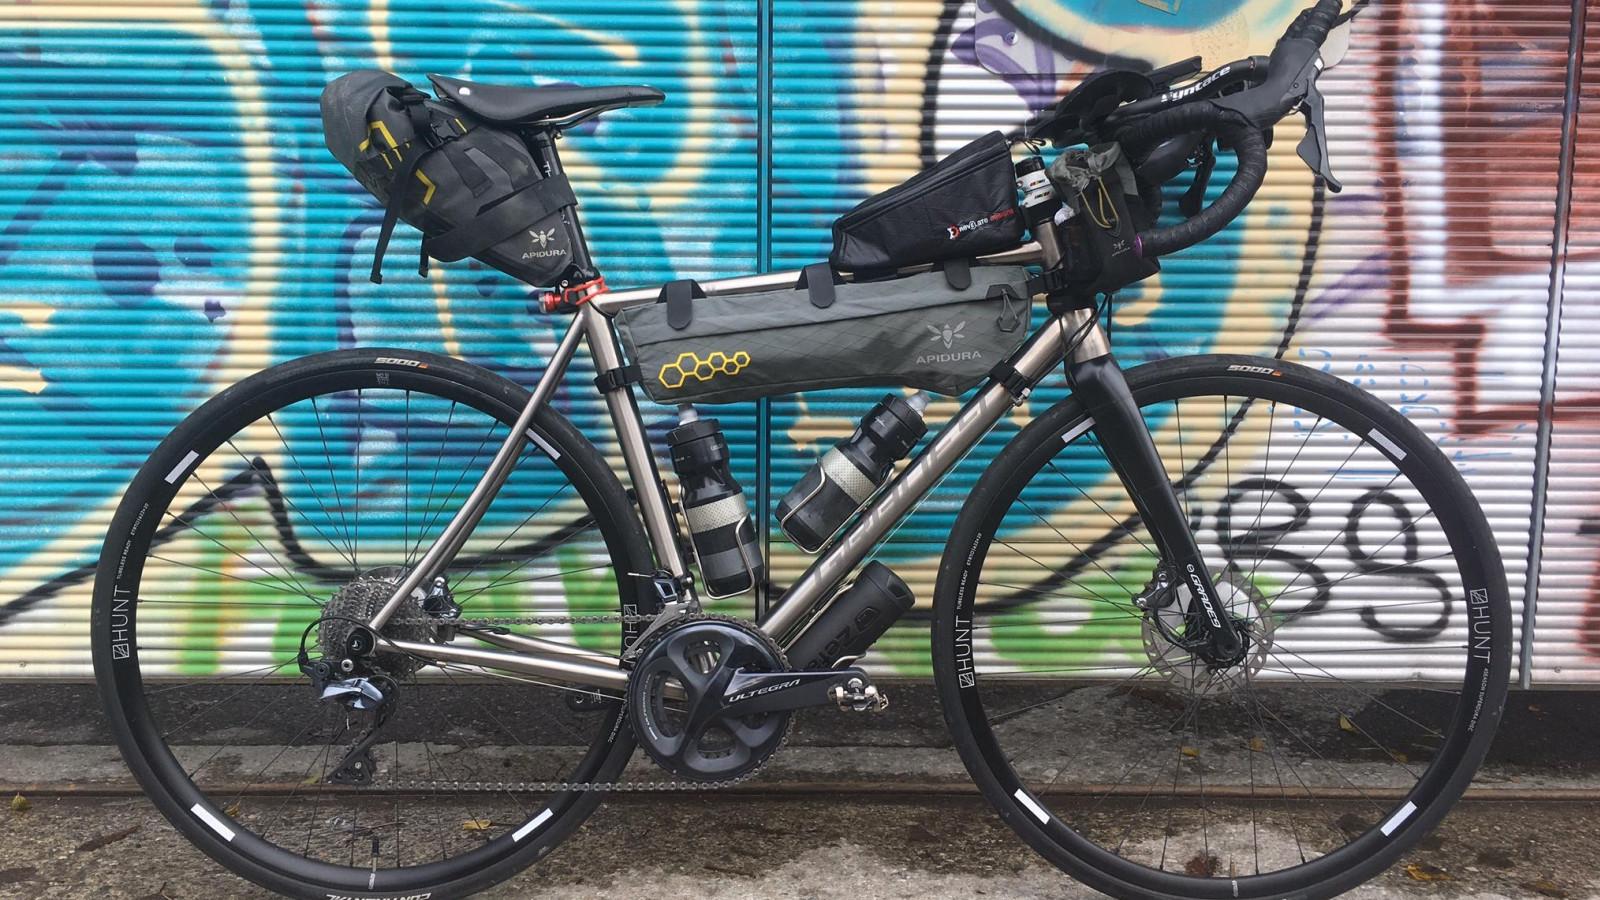 Bikes of Two Volcano Sprint 2019